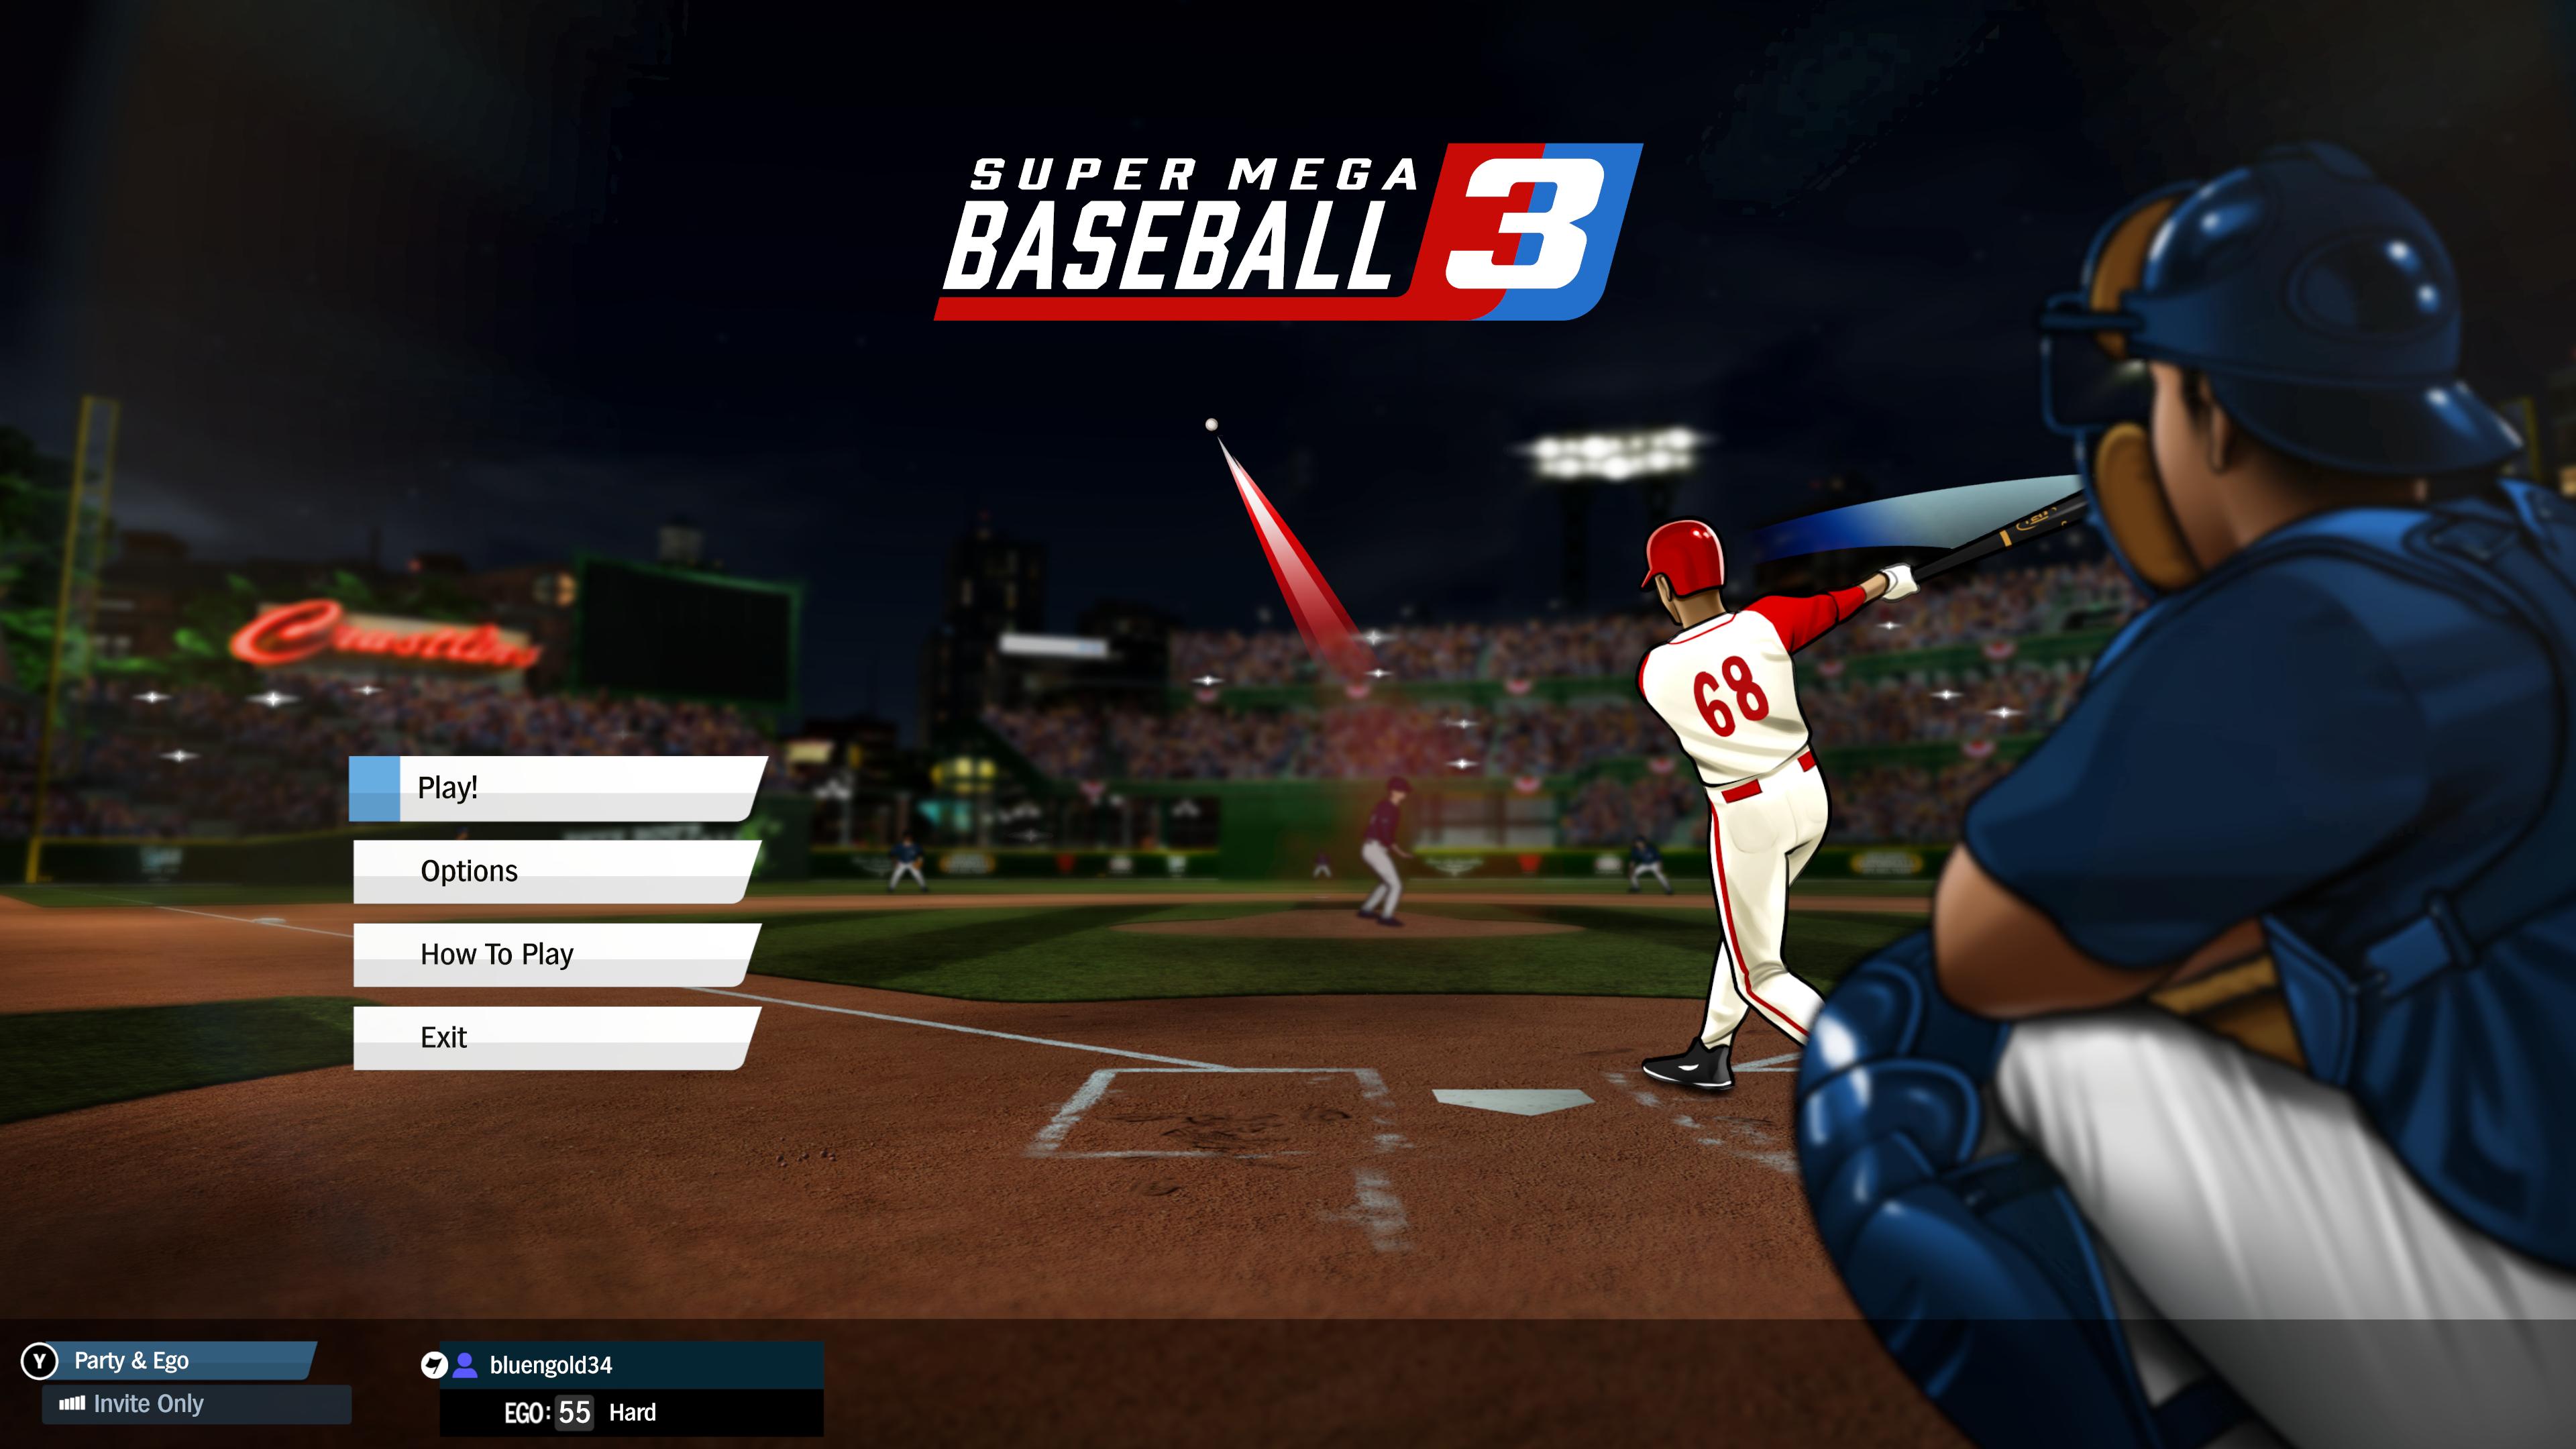 Super Mega Baseball 3 5_11_2020 12_11_06 PM